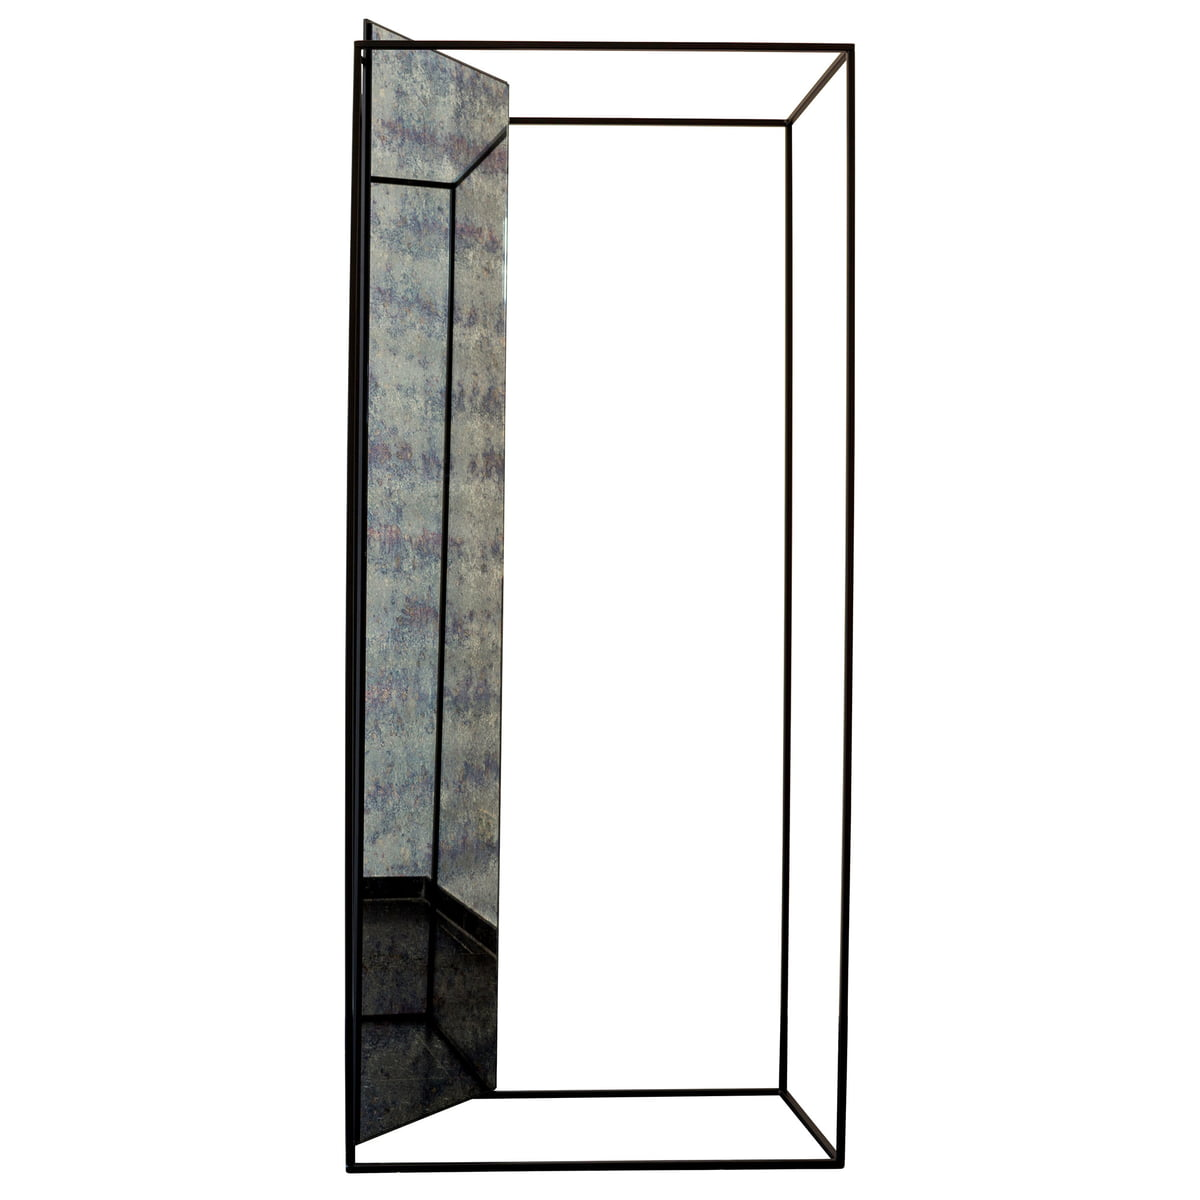 [Pulpo/풀포] Miro Mirror Hall Stand, antique glass / black (RAL 9005) // 미로 미러 홀 스탠드, 엔틱 글래스 / 블랙 (RAL 9005)